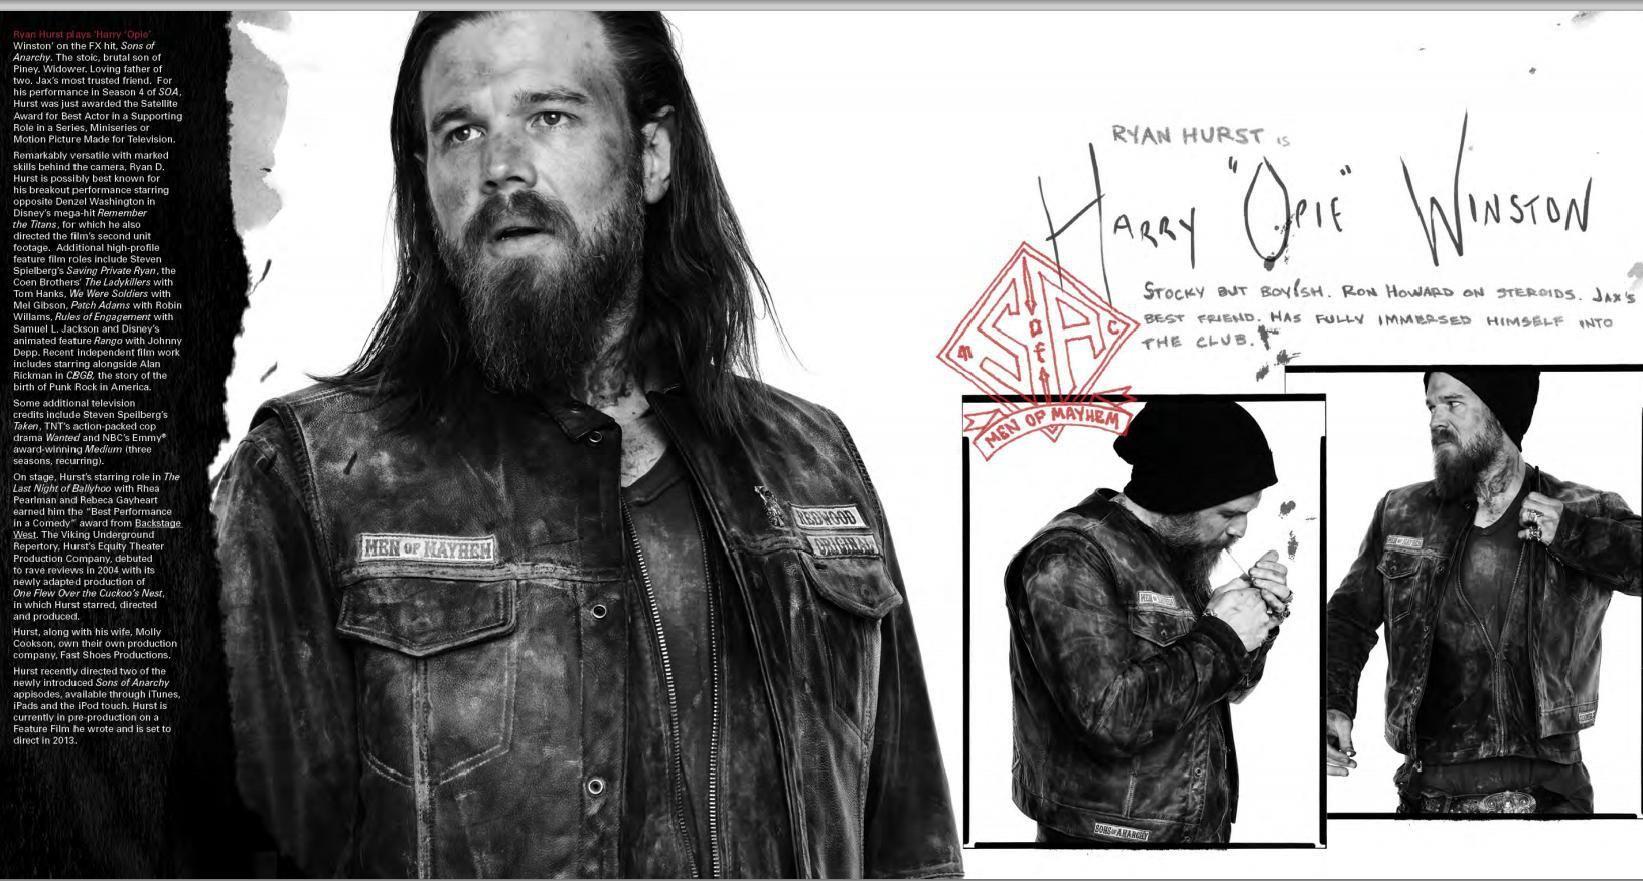 Ryan Hurst Wallpaper Photo Credit Fx Sons Of Anarchy Samcro